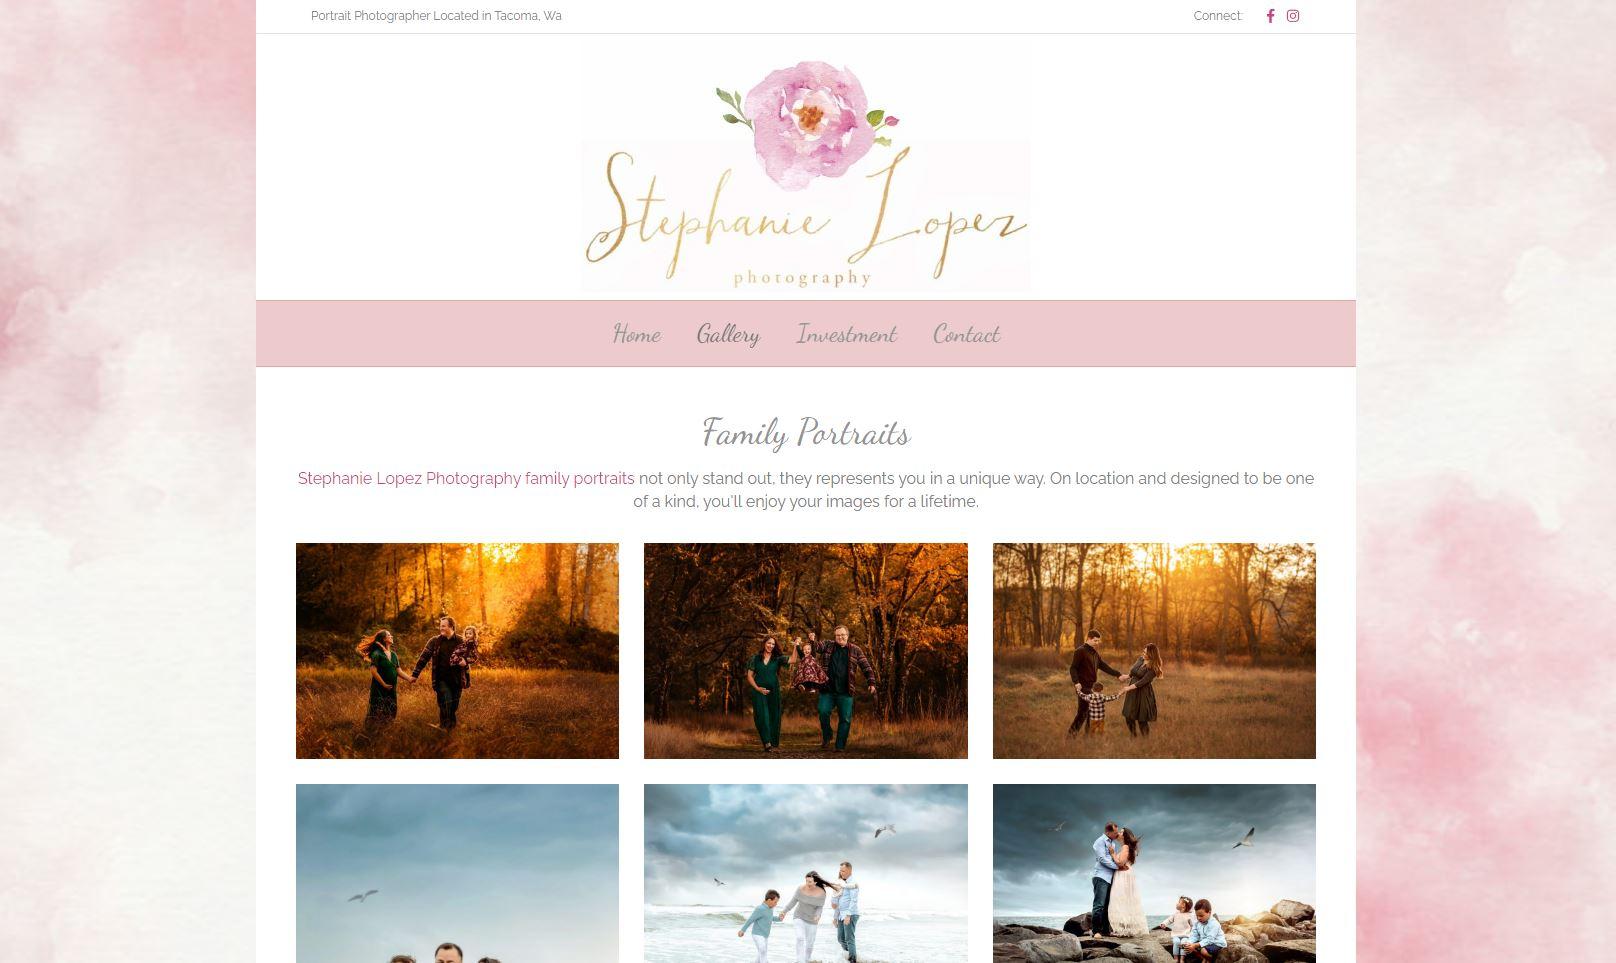 Stephanie Lopez Web Design, Hosting SEO